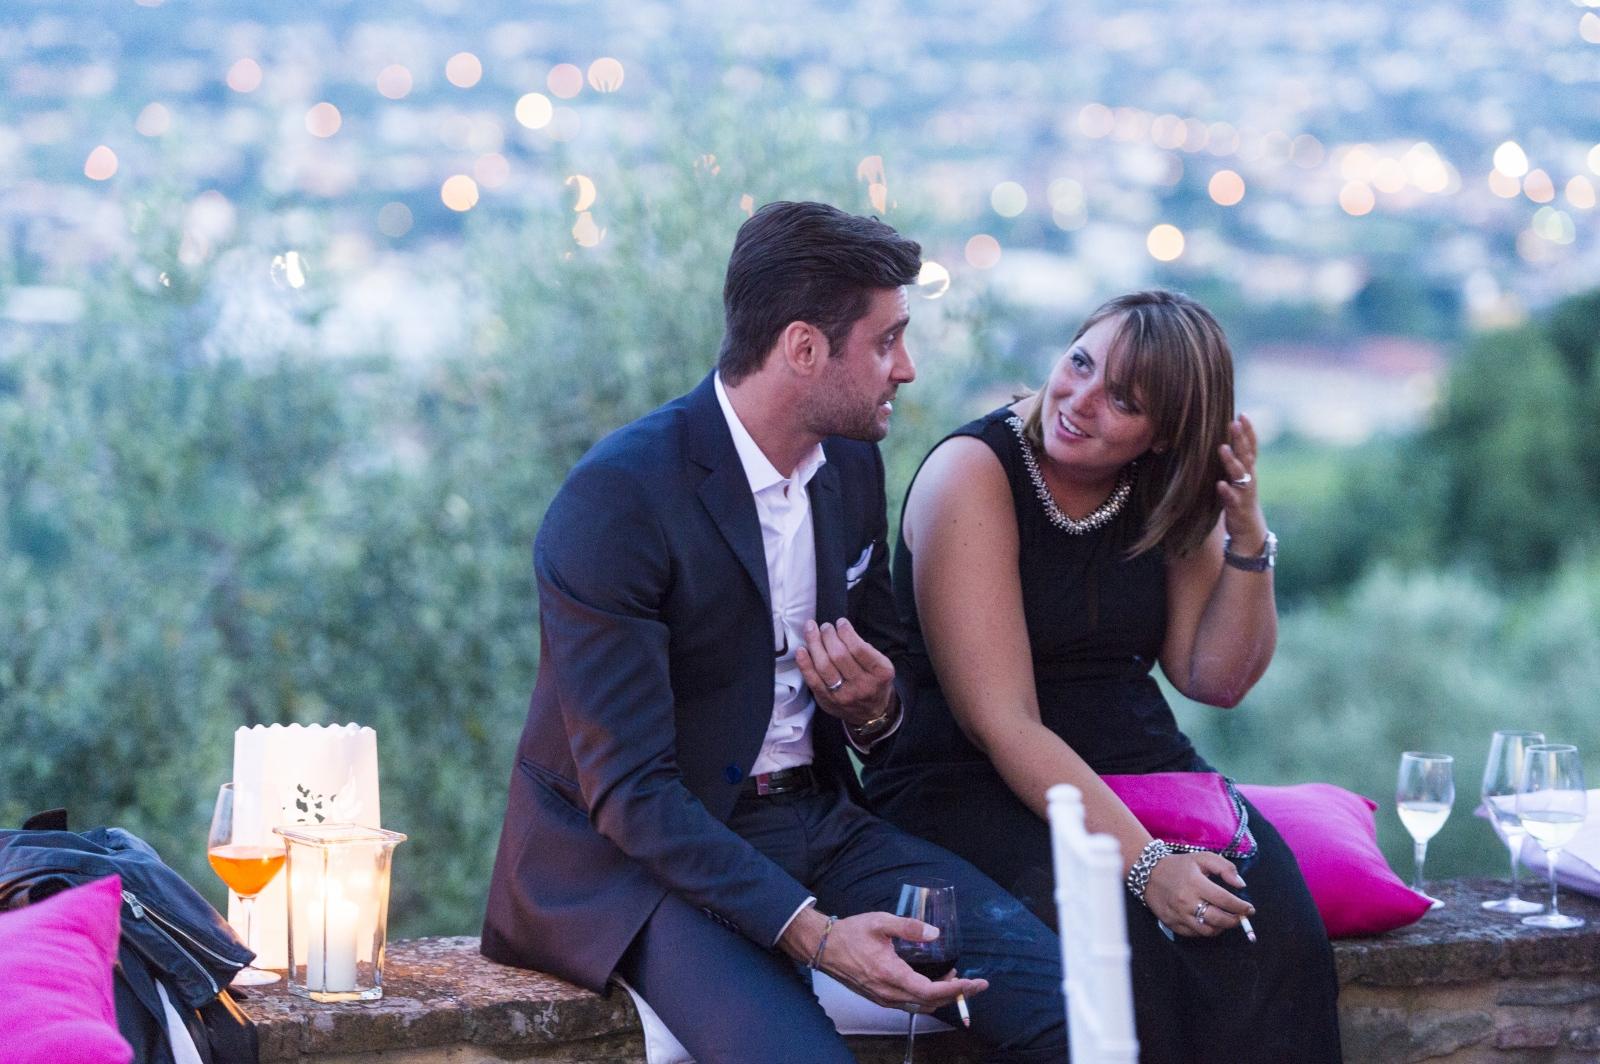 Wedding in Tuscany - Under the tuscan sun. | Wedding in Tuscany ...